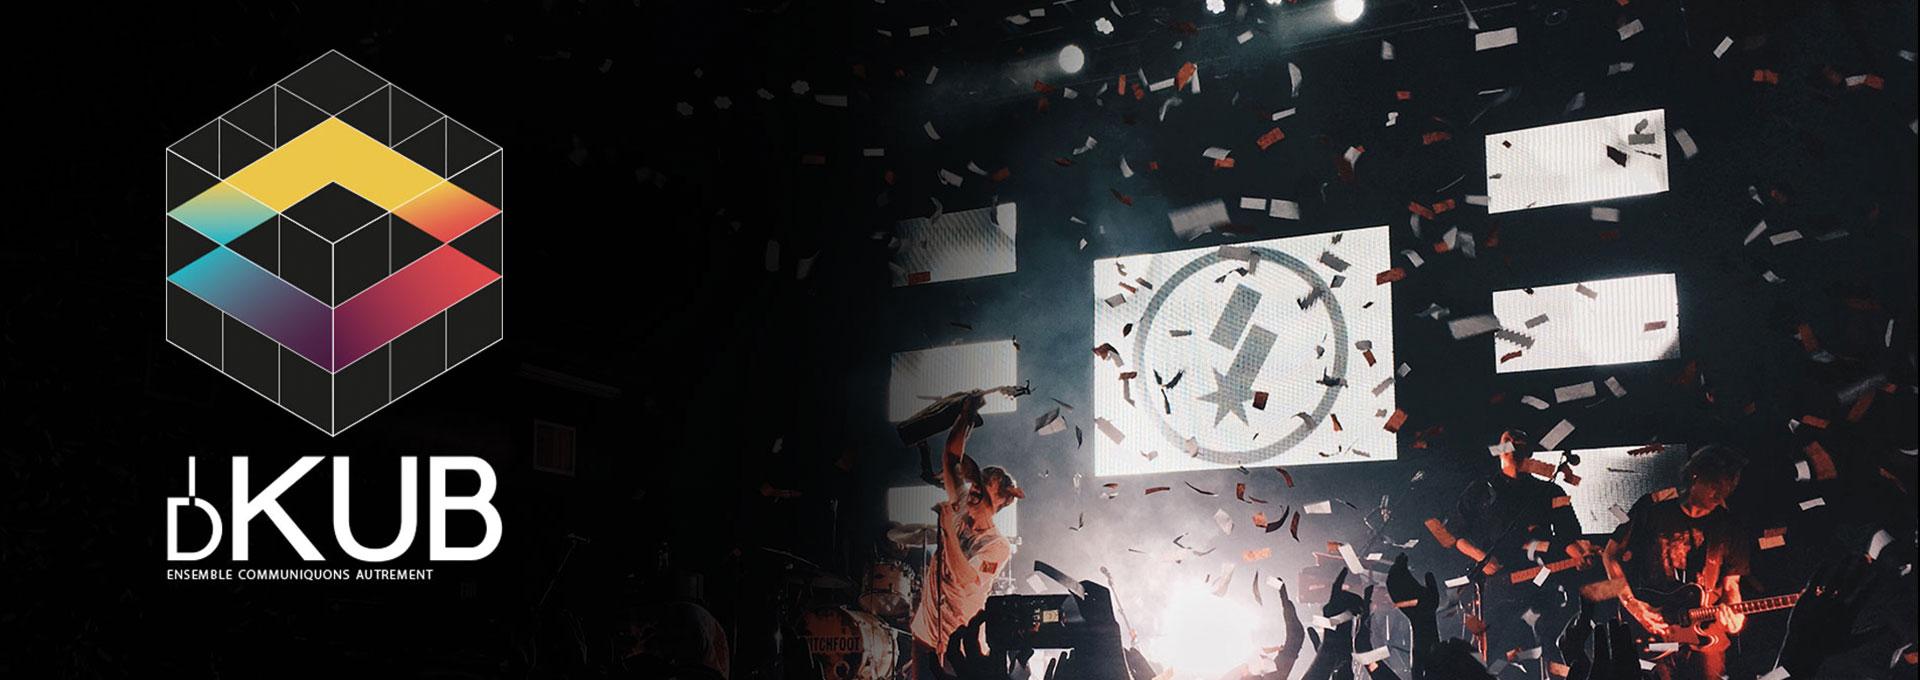 logo id kub, concert